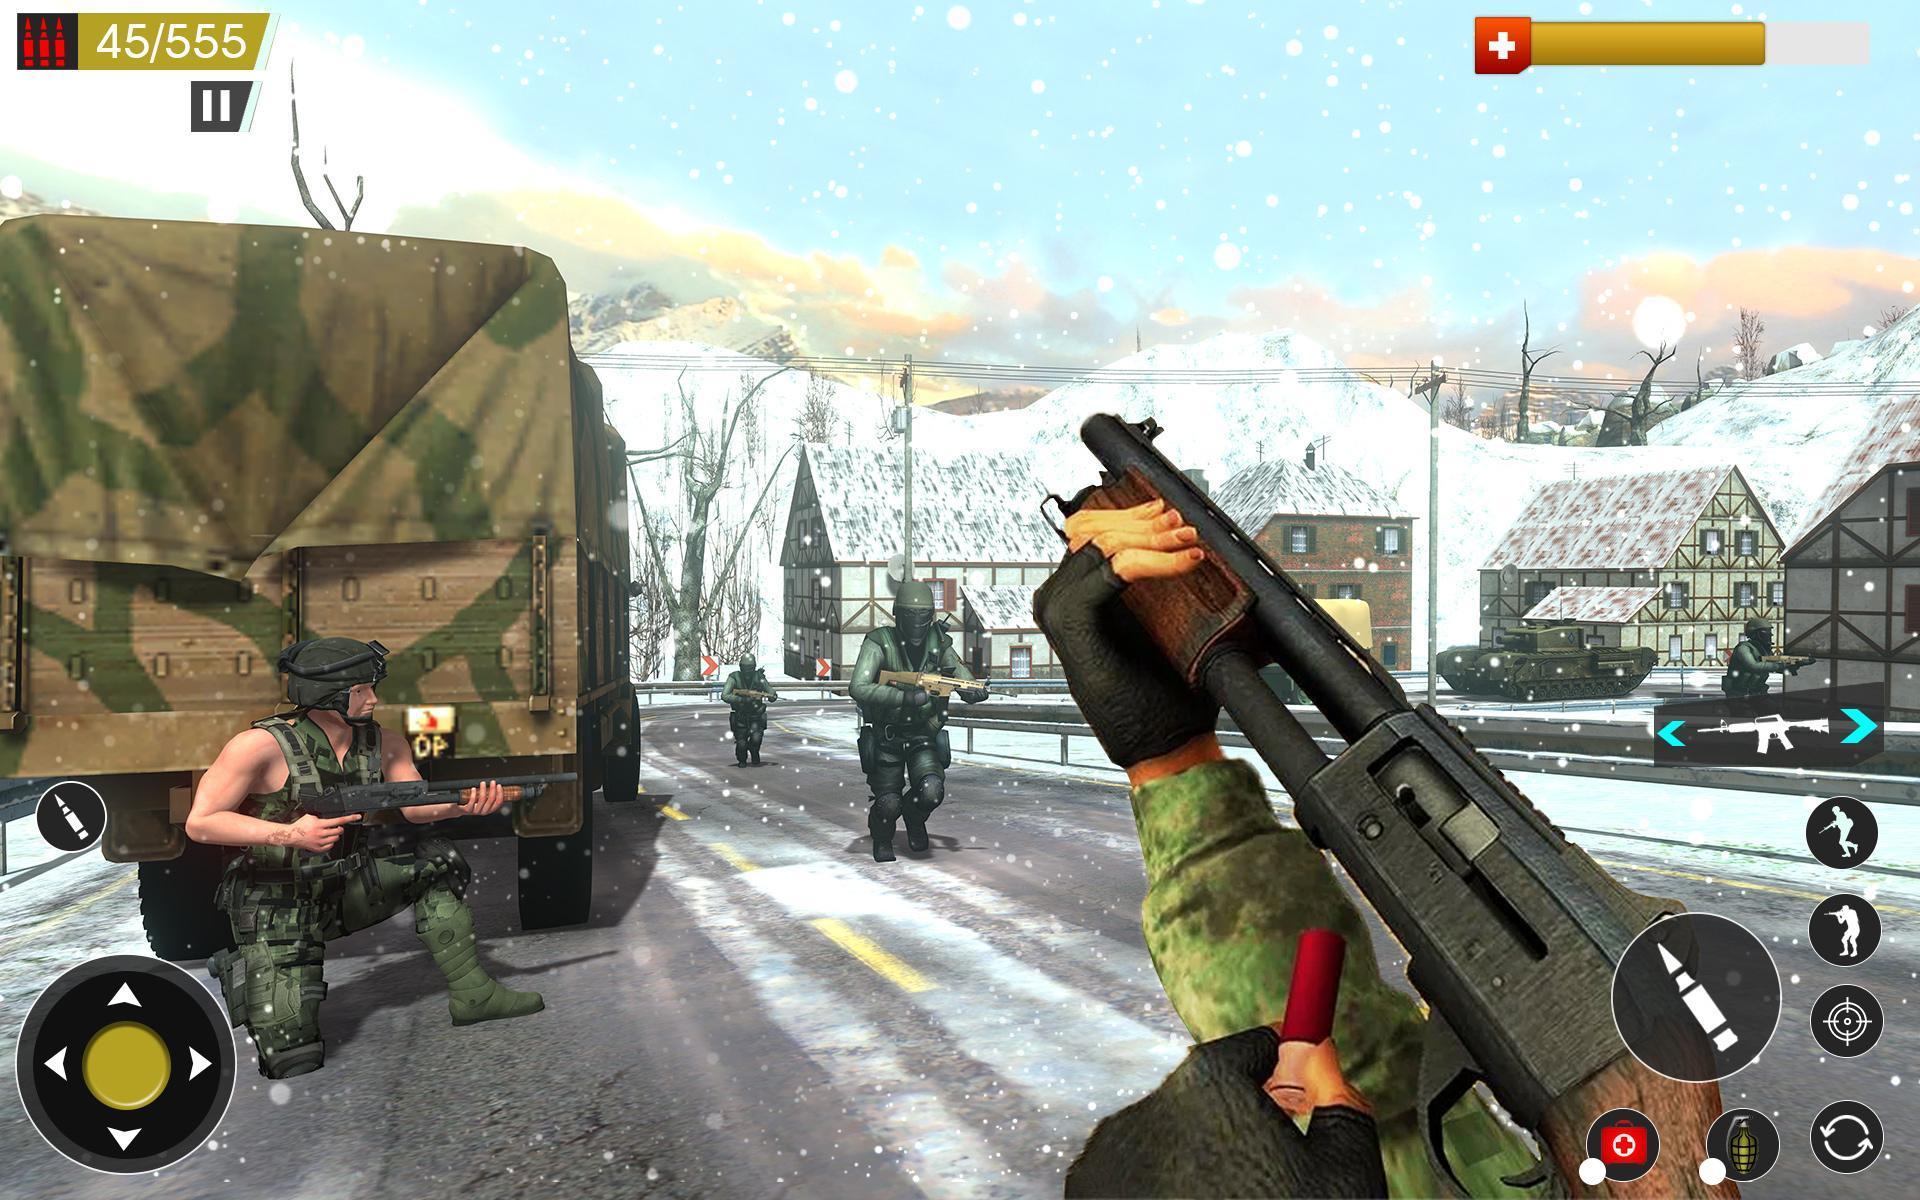 American World War Fps Shooter Free Shooting Games 4.8 Screenshot 2